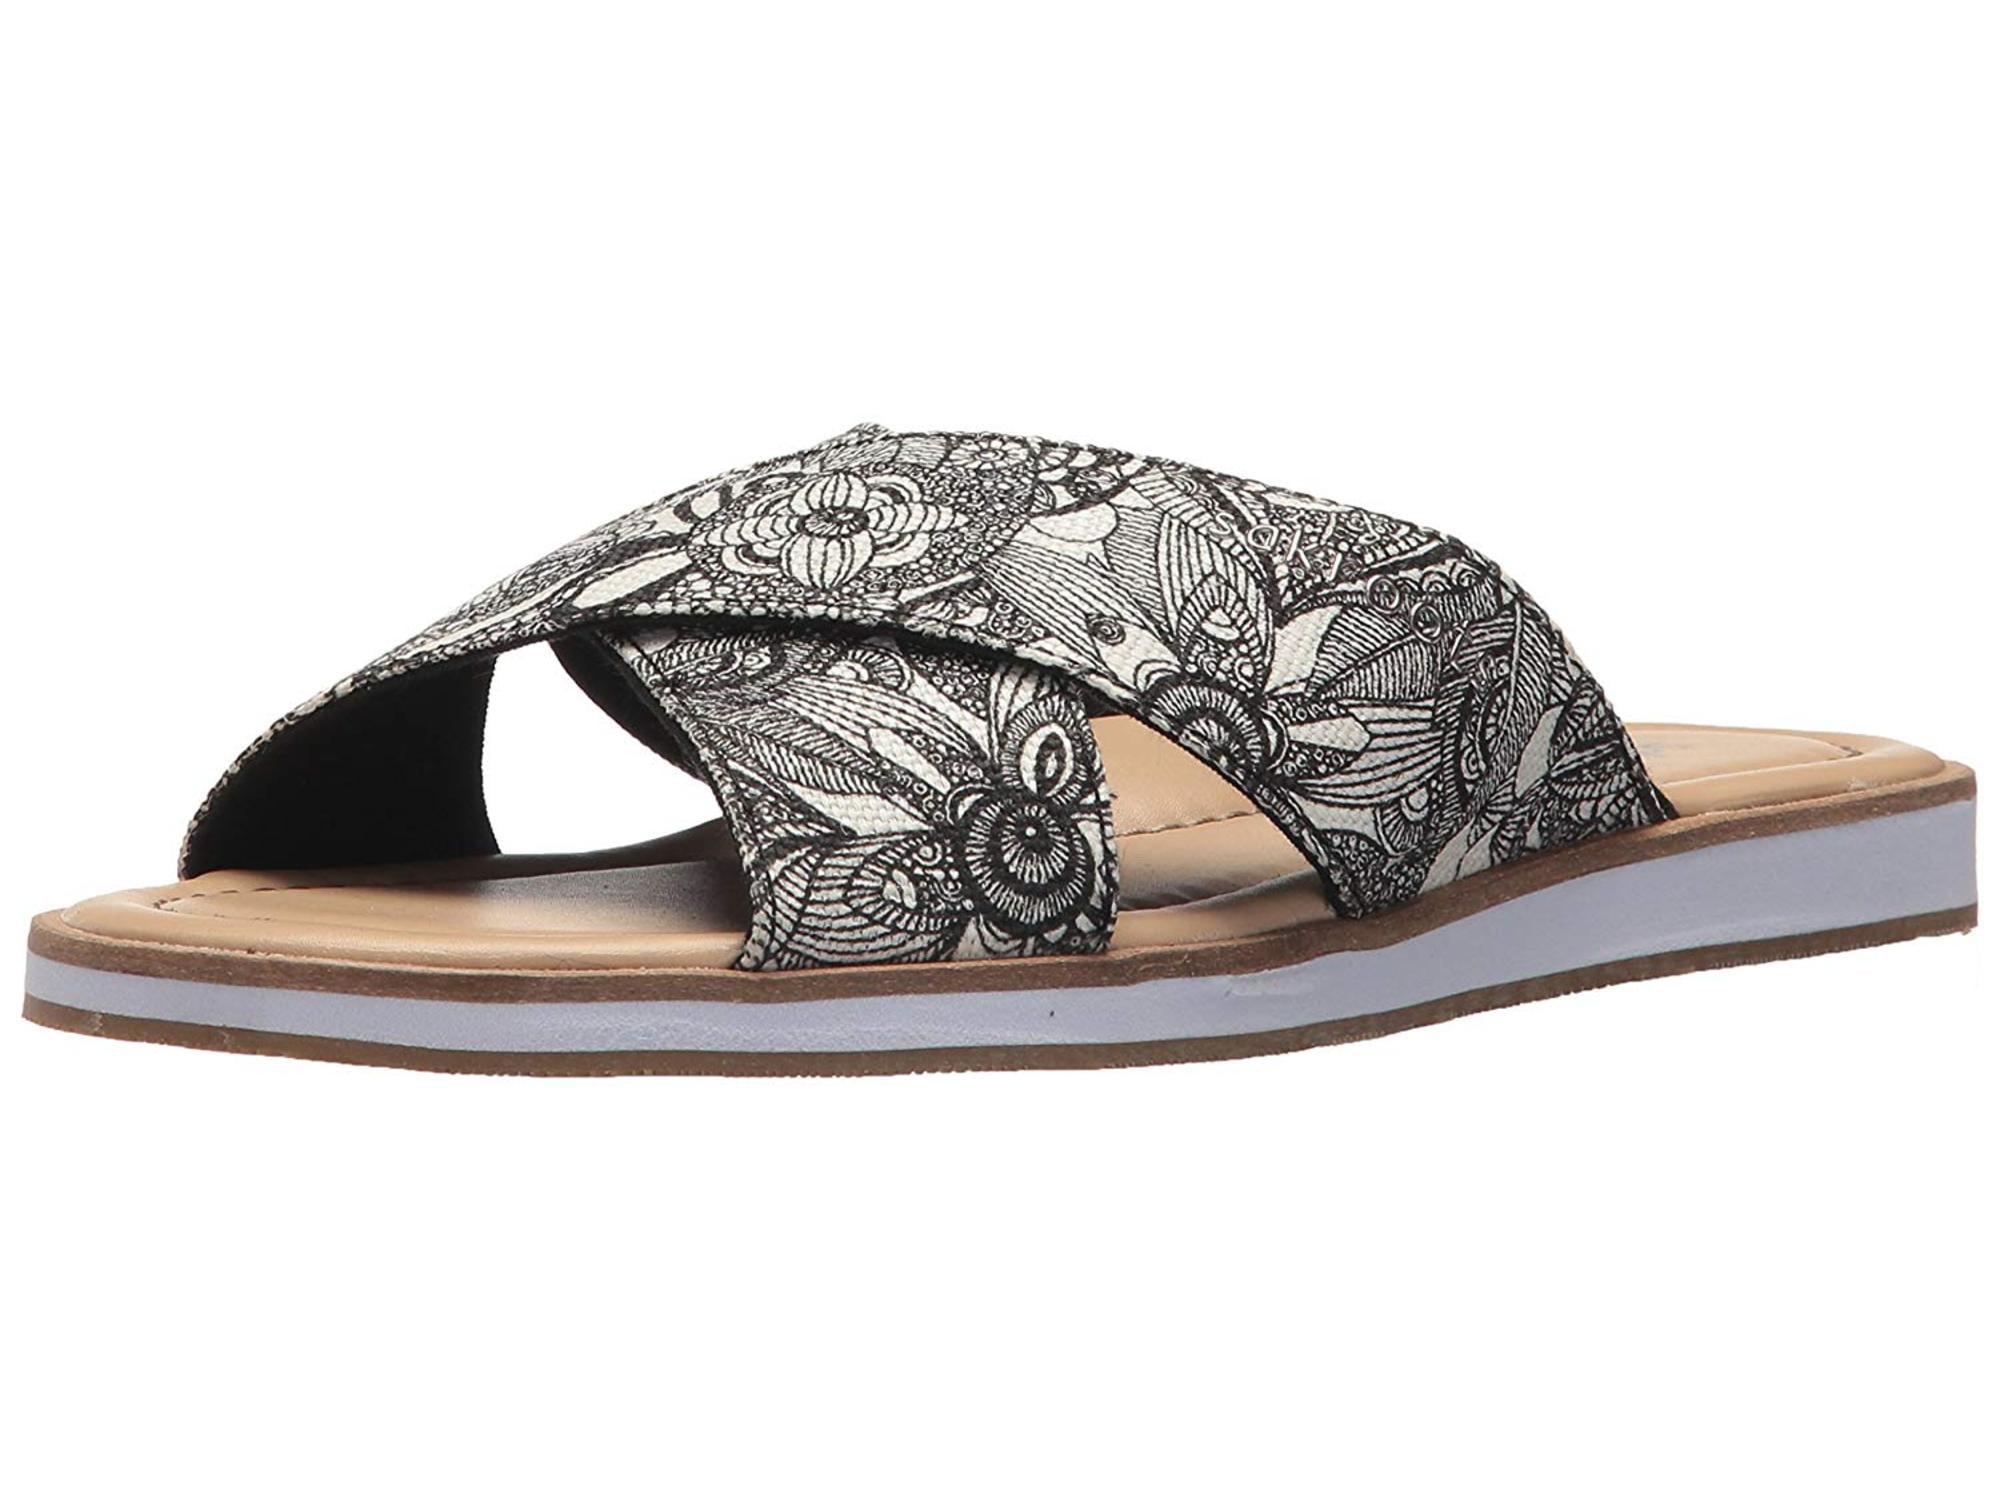 5d27ba2786f67 The Sak Womens calypso Open Toe Casual Slide Sandals